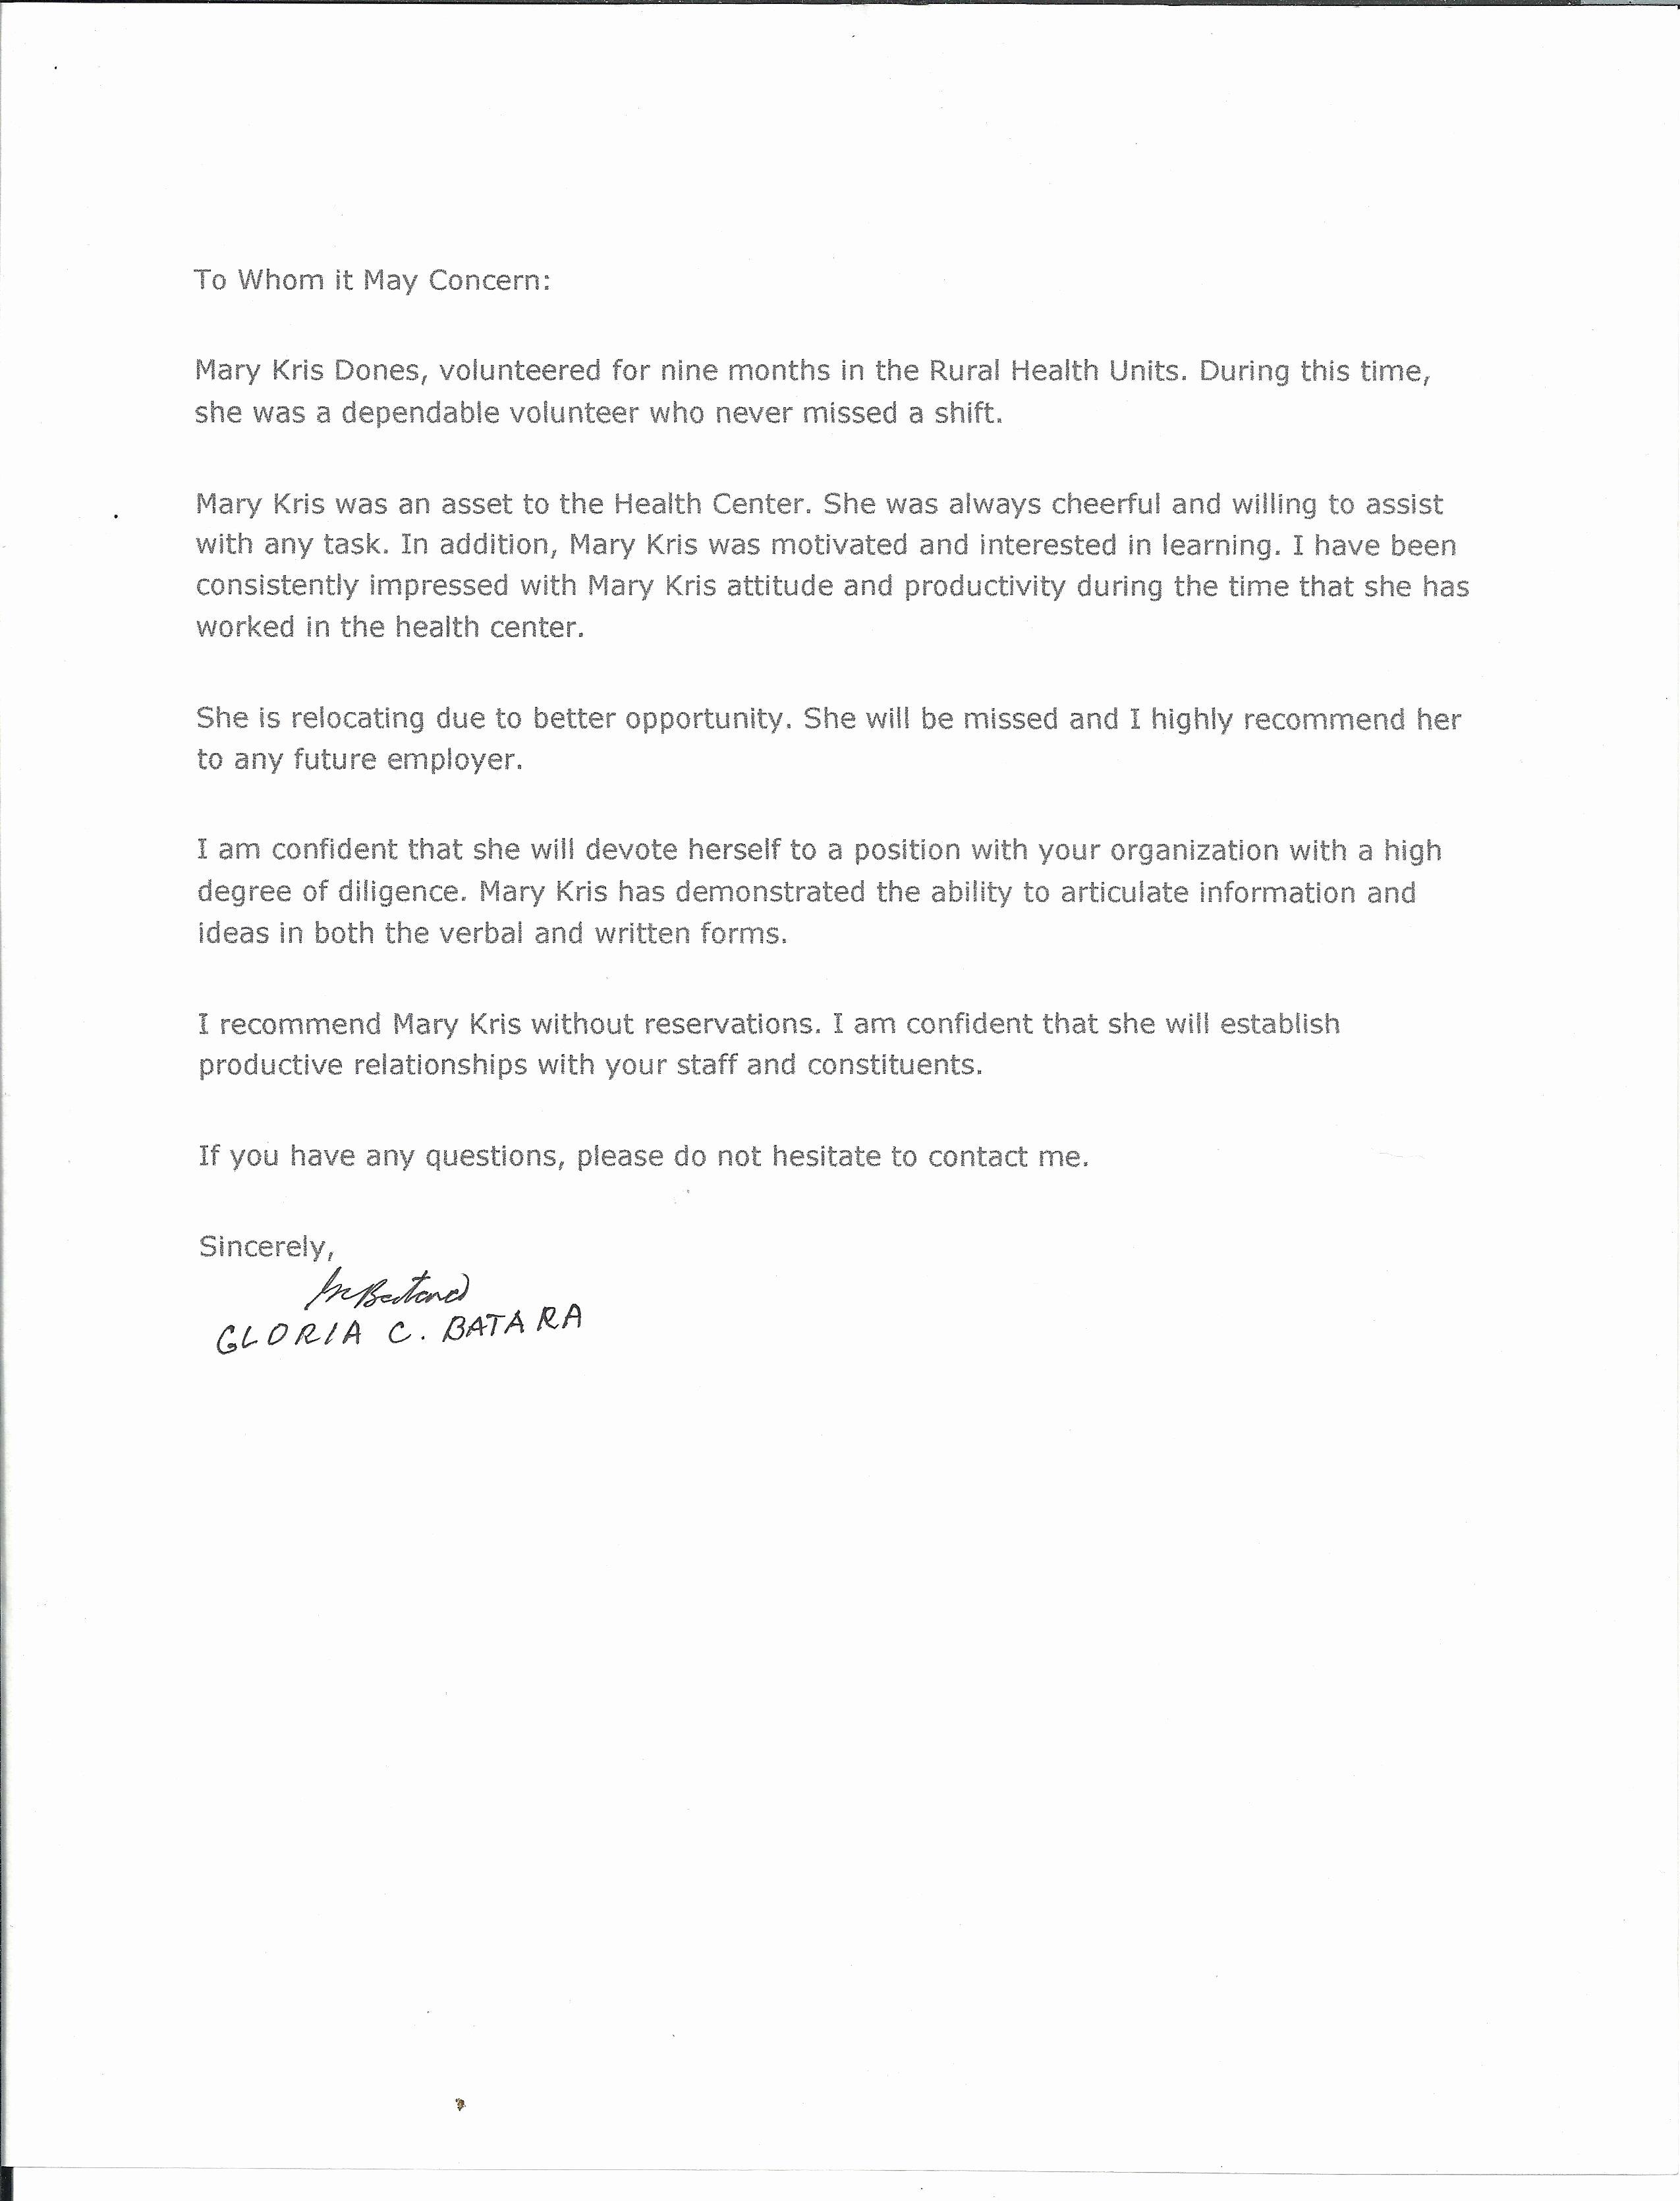 Babysitter Letter Of Recommendation Inspirational Nanny Re Mendation Letter Cover Letter Exle Reference Letter